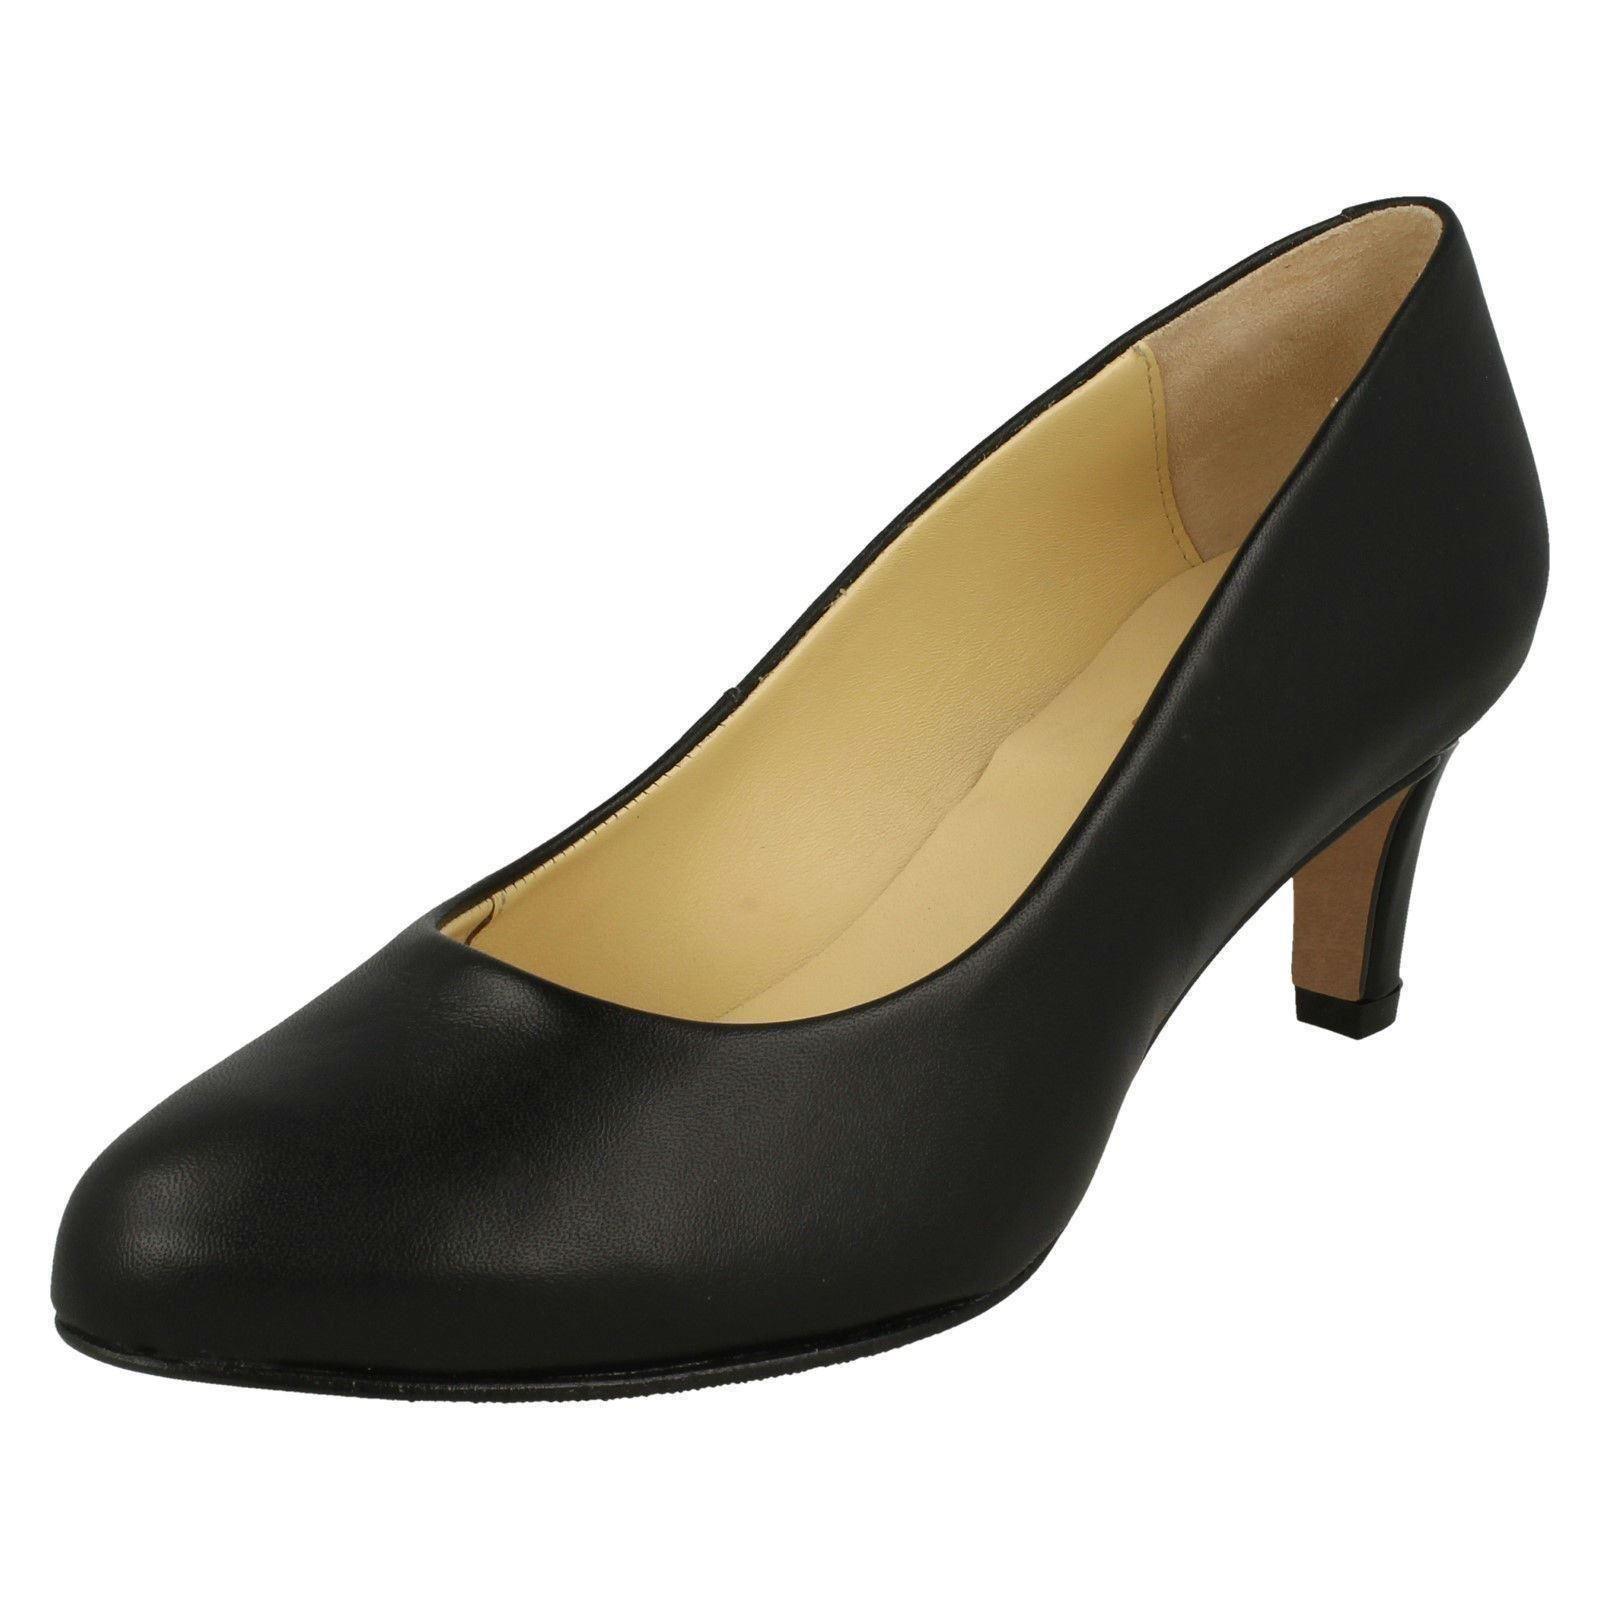 Señoras Zapatos van dal Tribunal Zapatos Señoras Linden 05953b